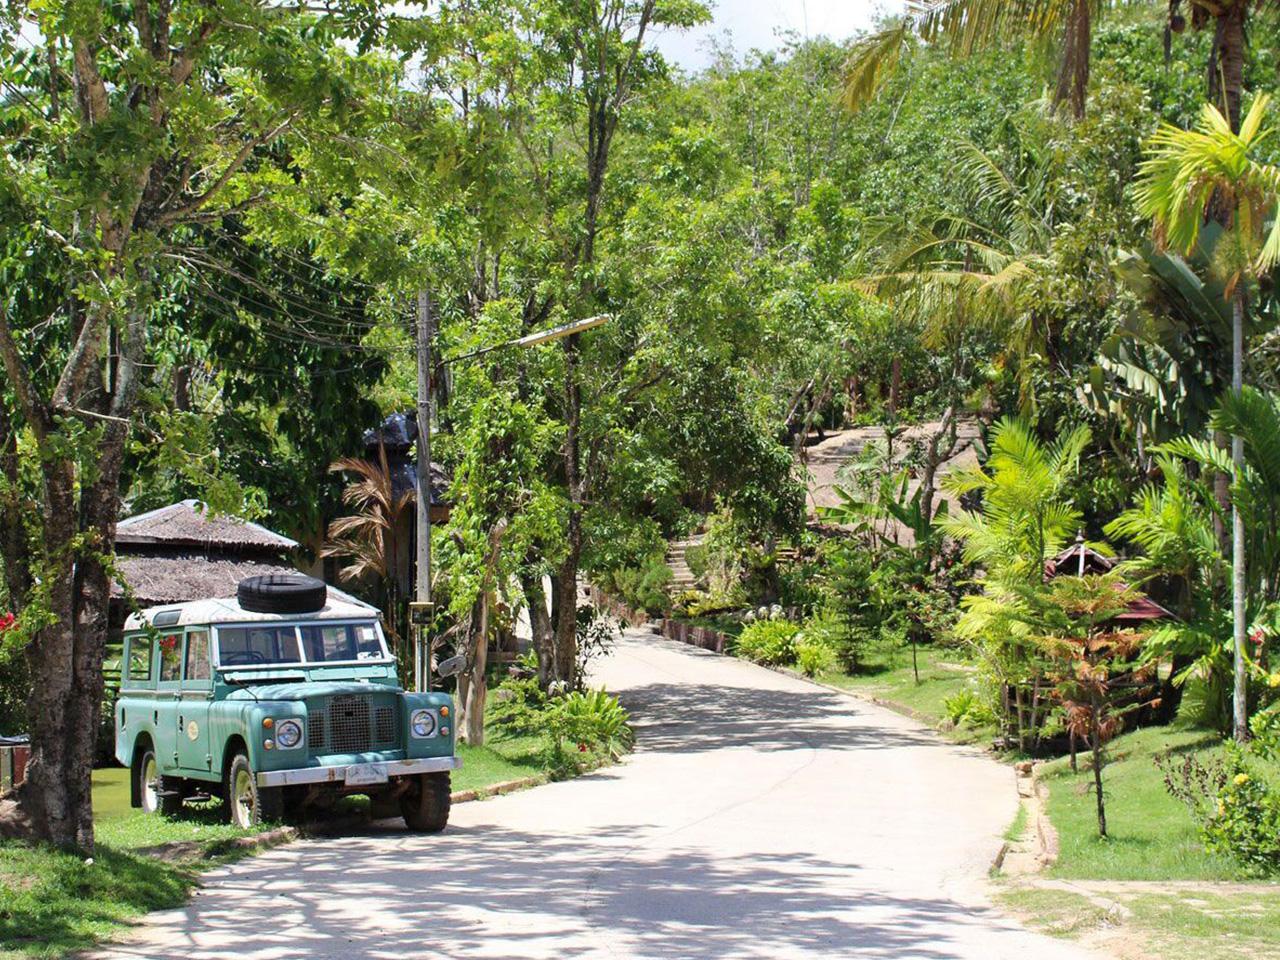 5 Phuket activities to add to your island getaway